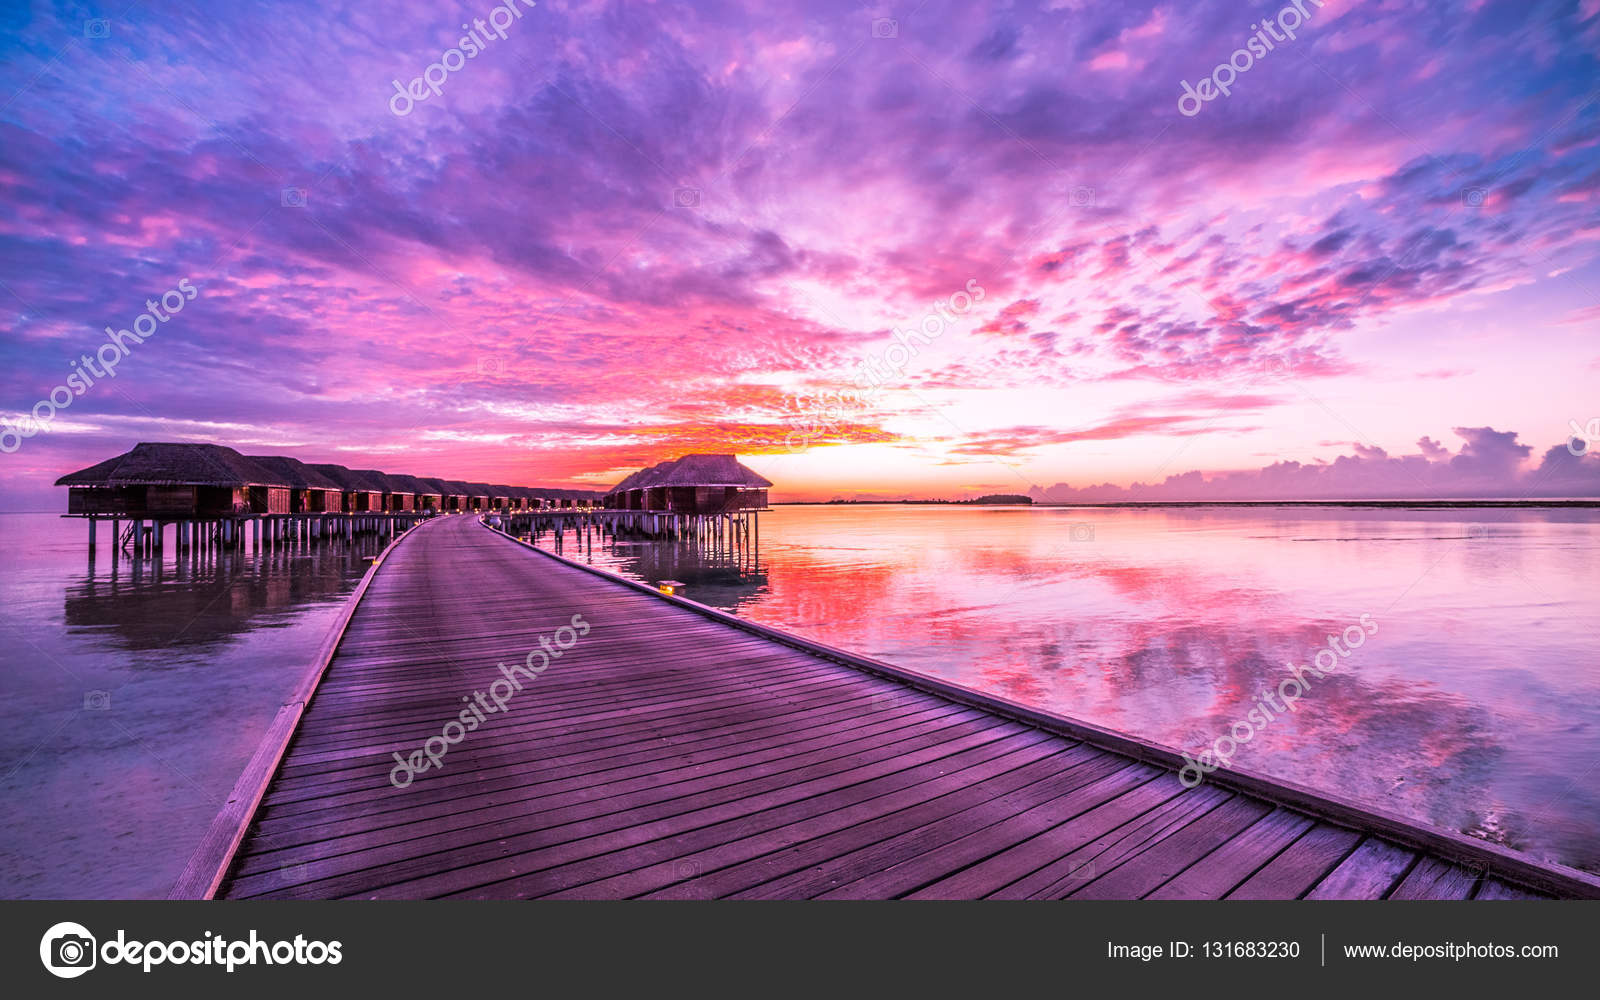 Summer travel holiday sunset on Maldives island, luxury water villas